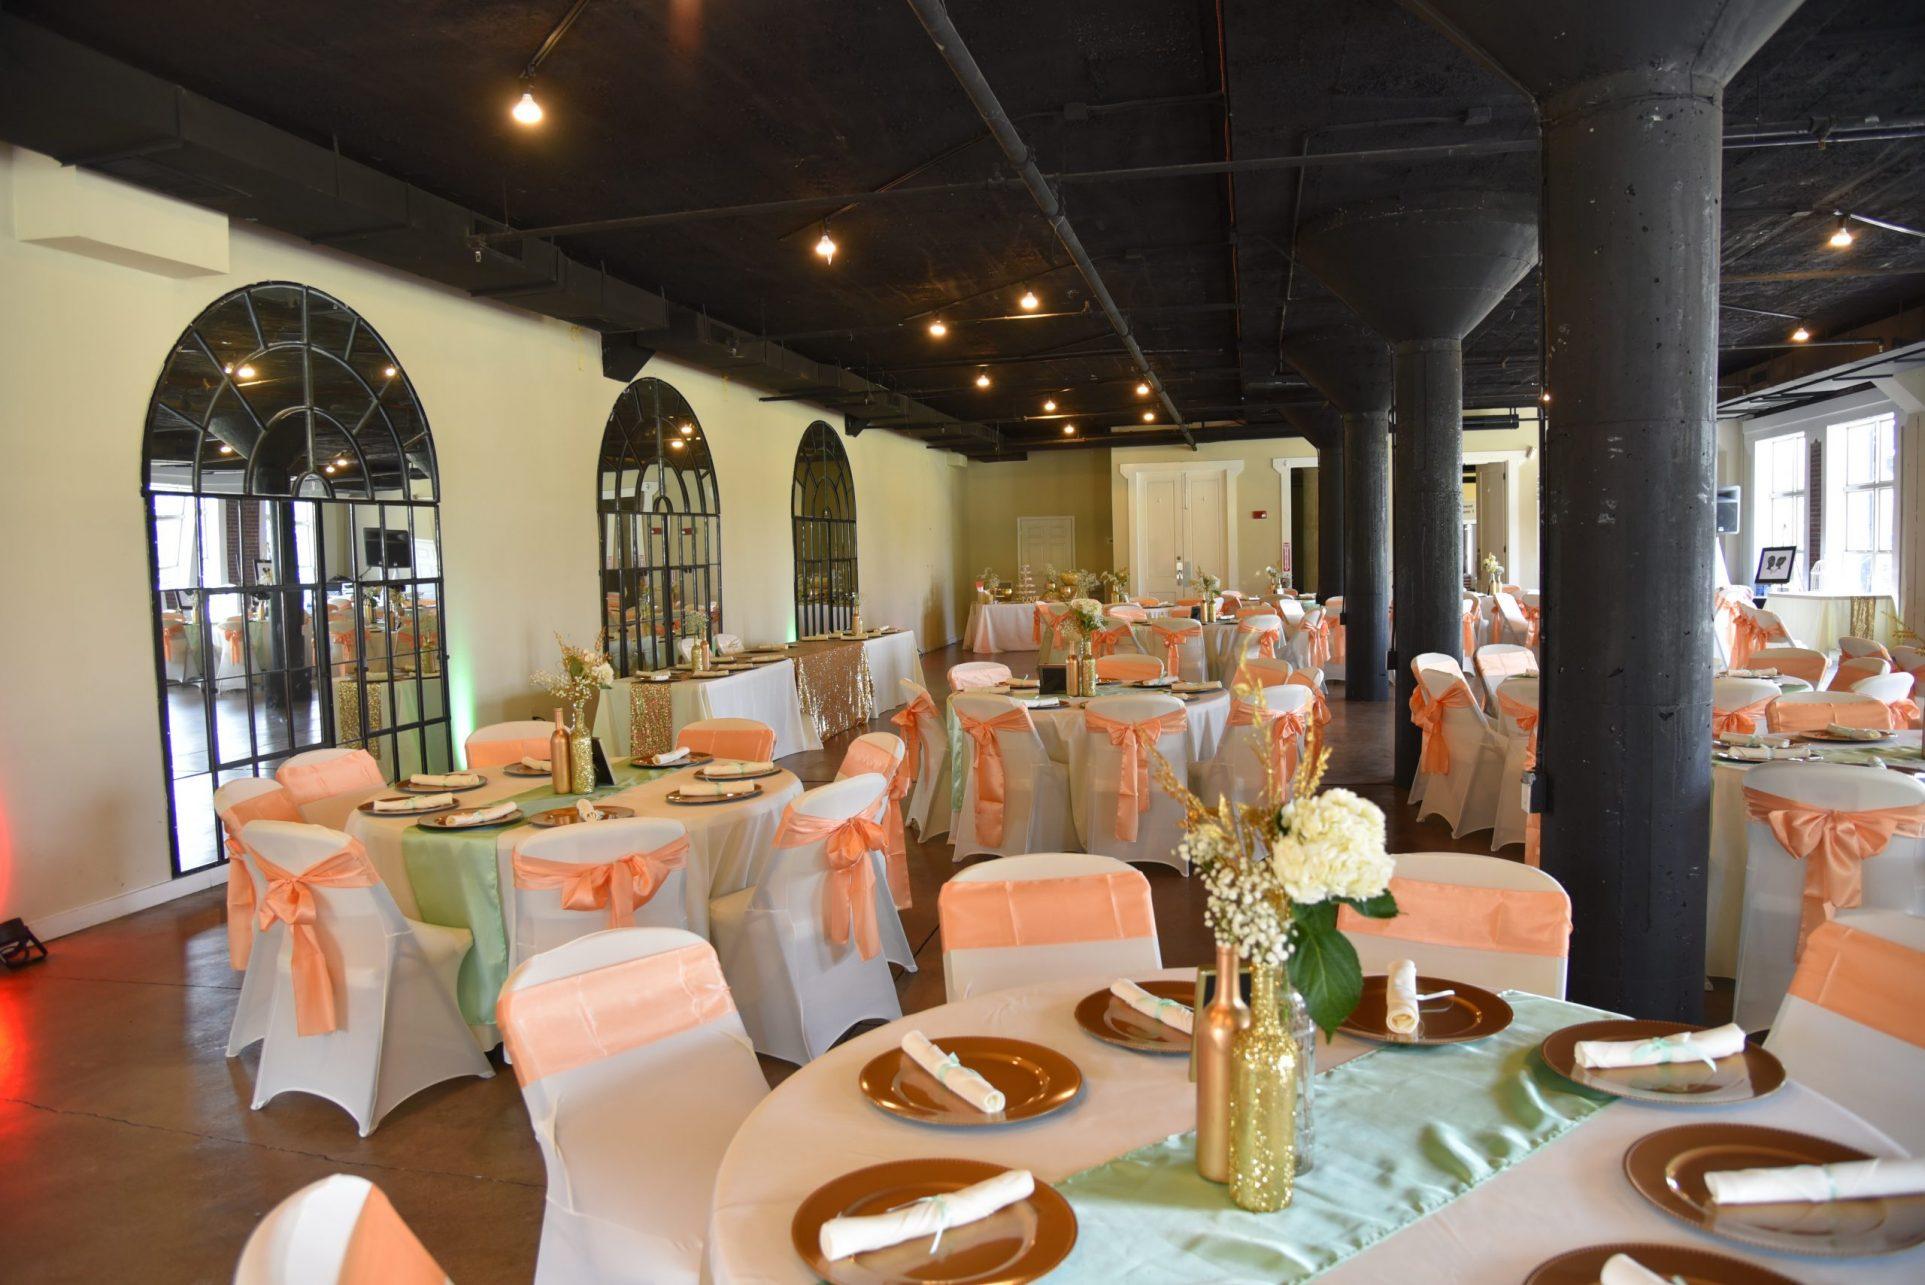 Monet Room: Set Tables